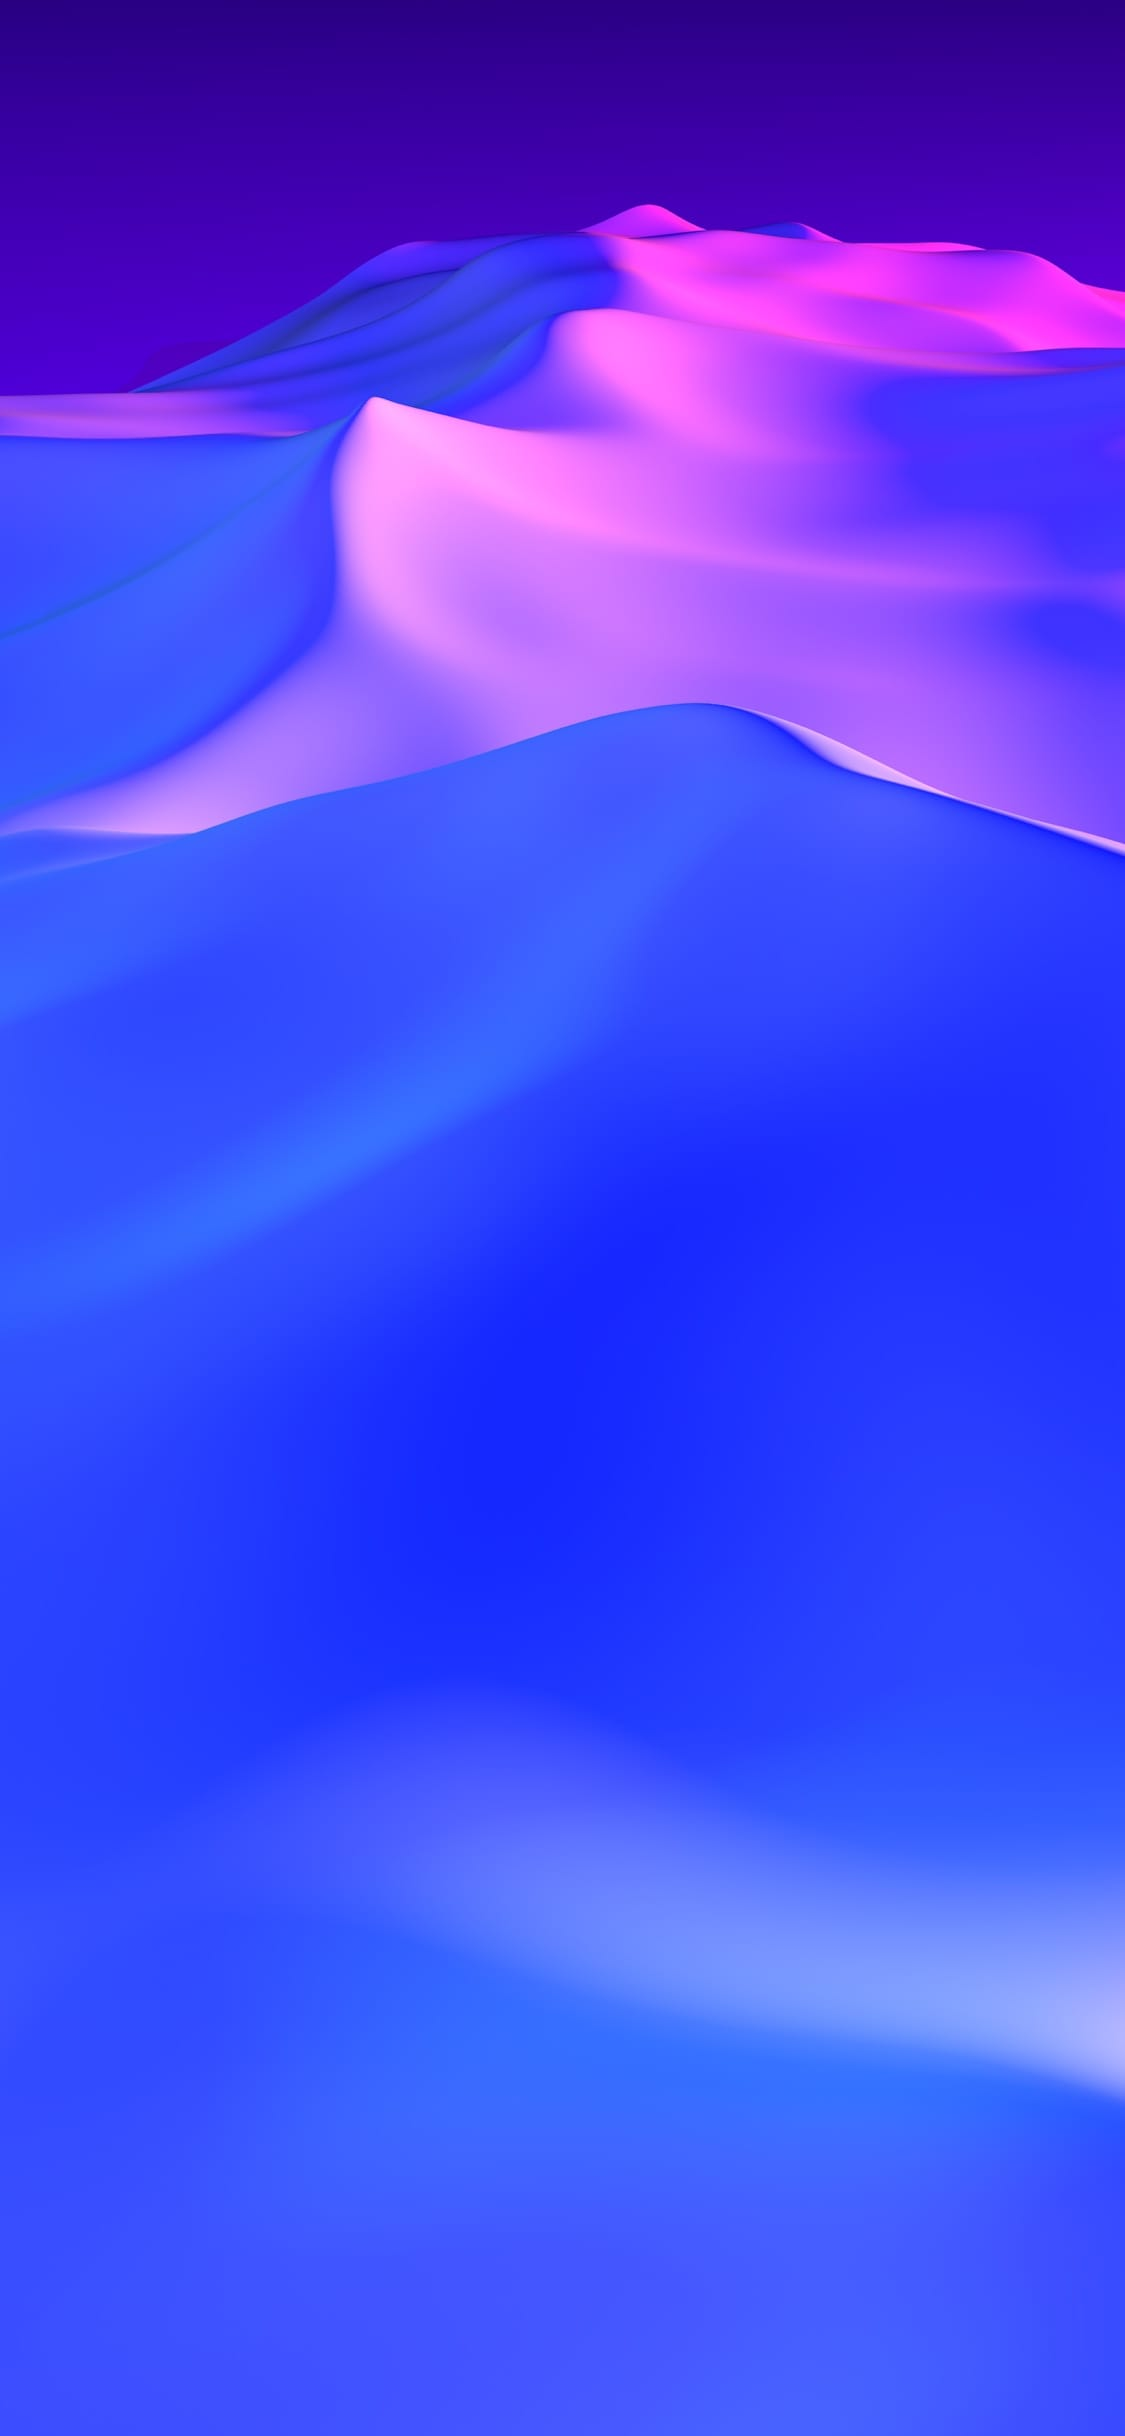 dark blue iPhone X image